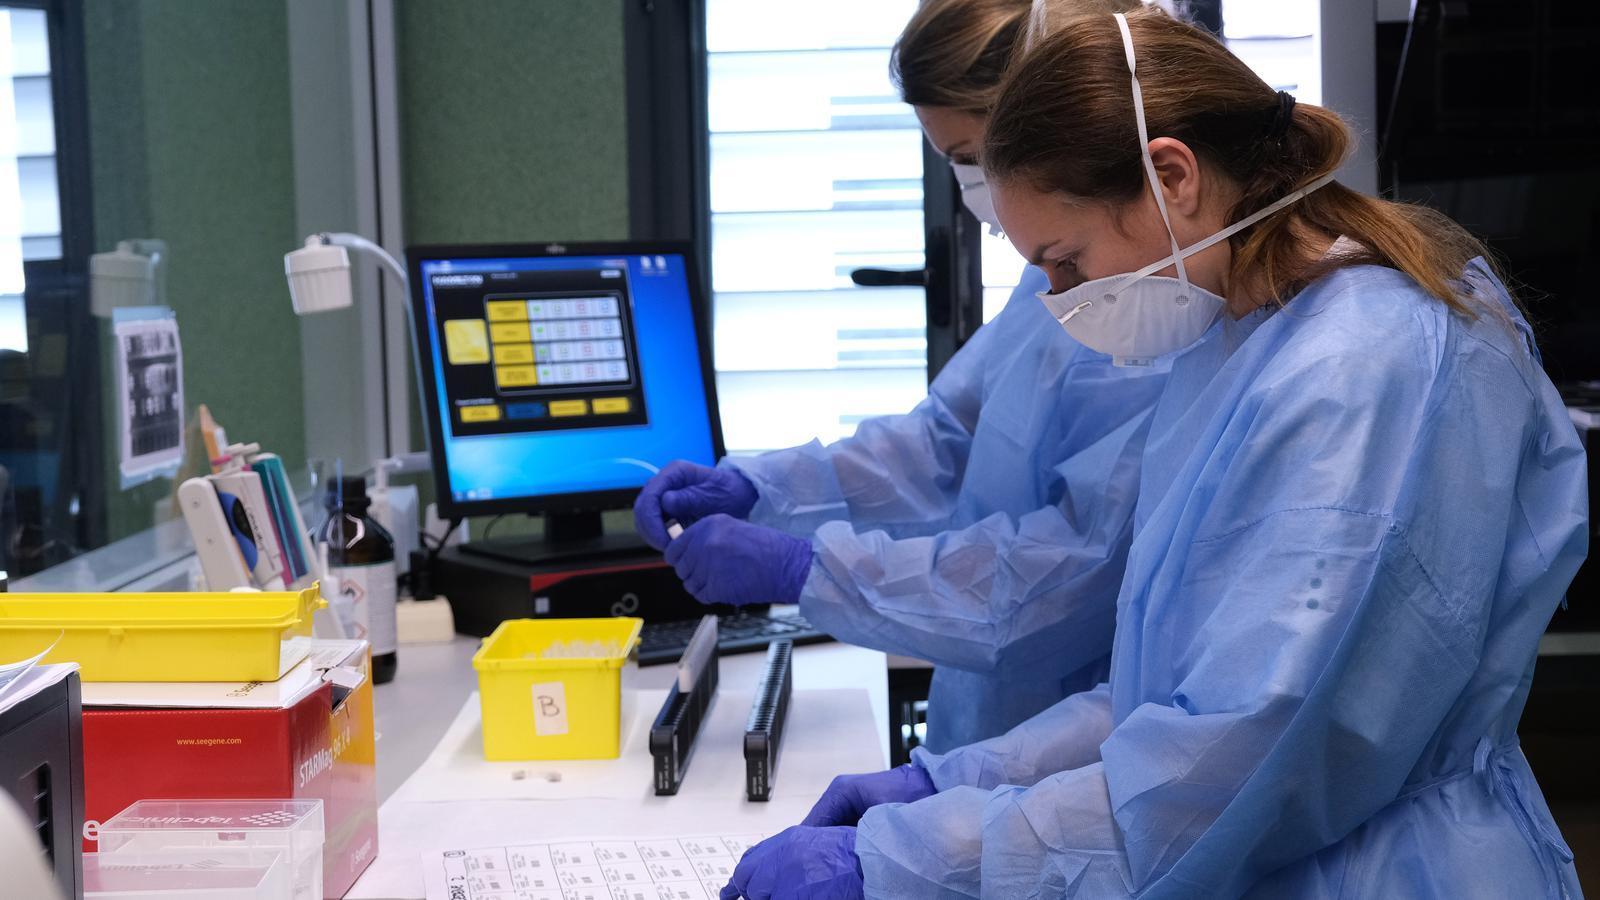 Laboratori de Microbiologia de Son Espases